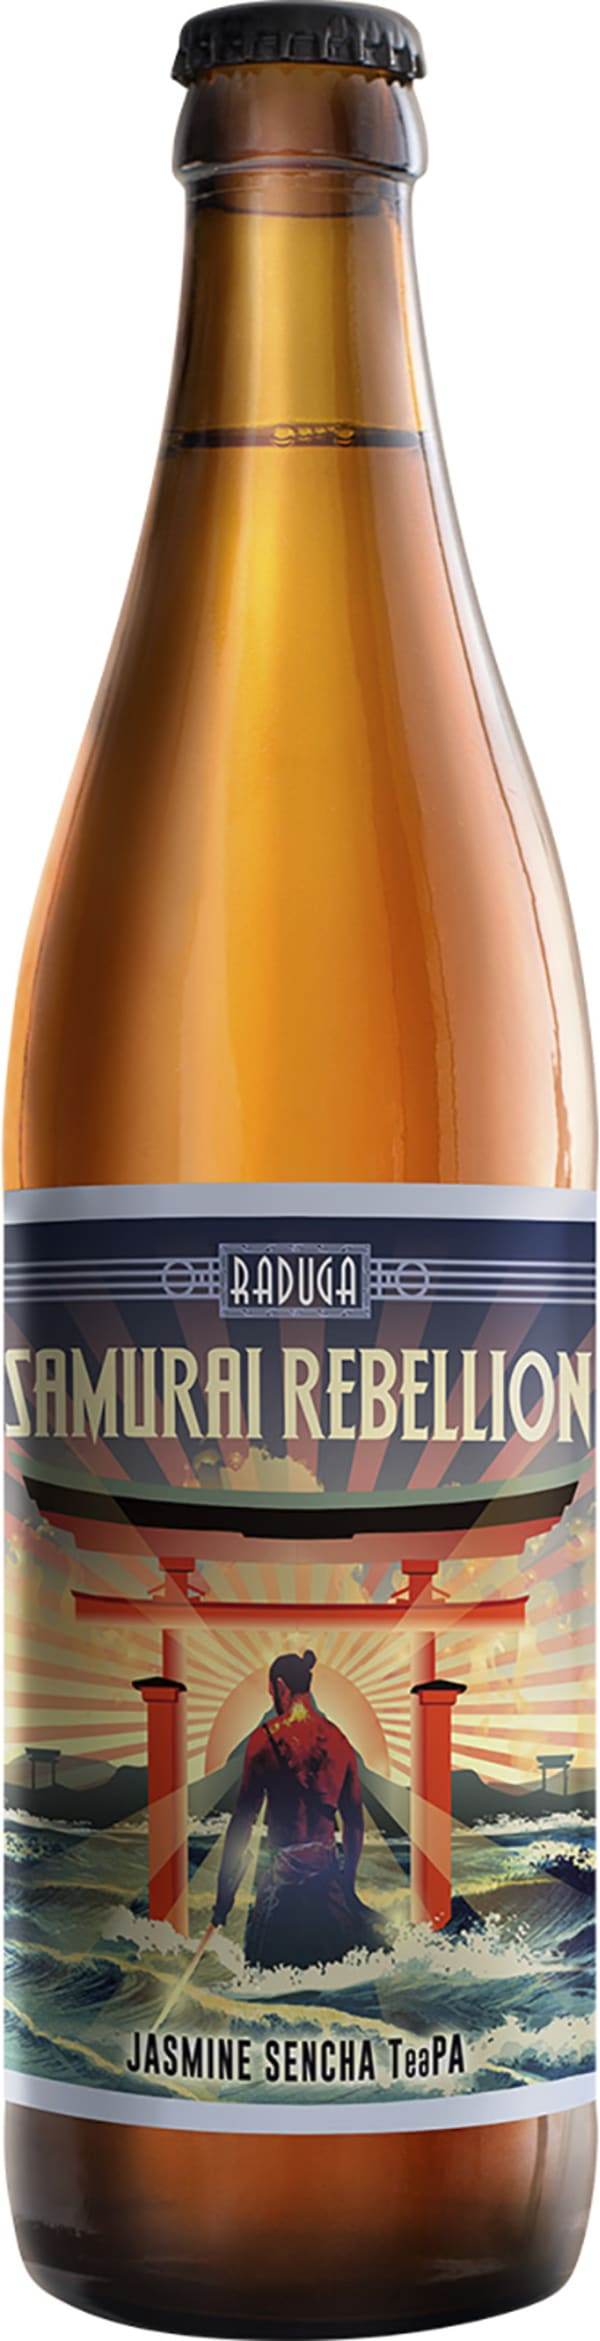 Raduga Samurai Rebellion